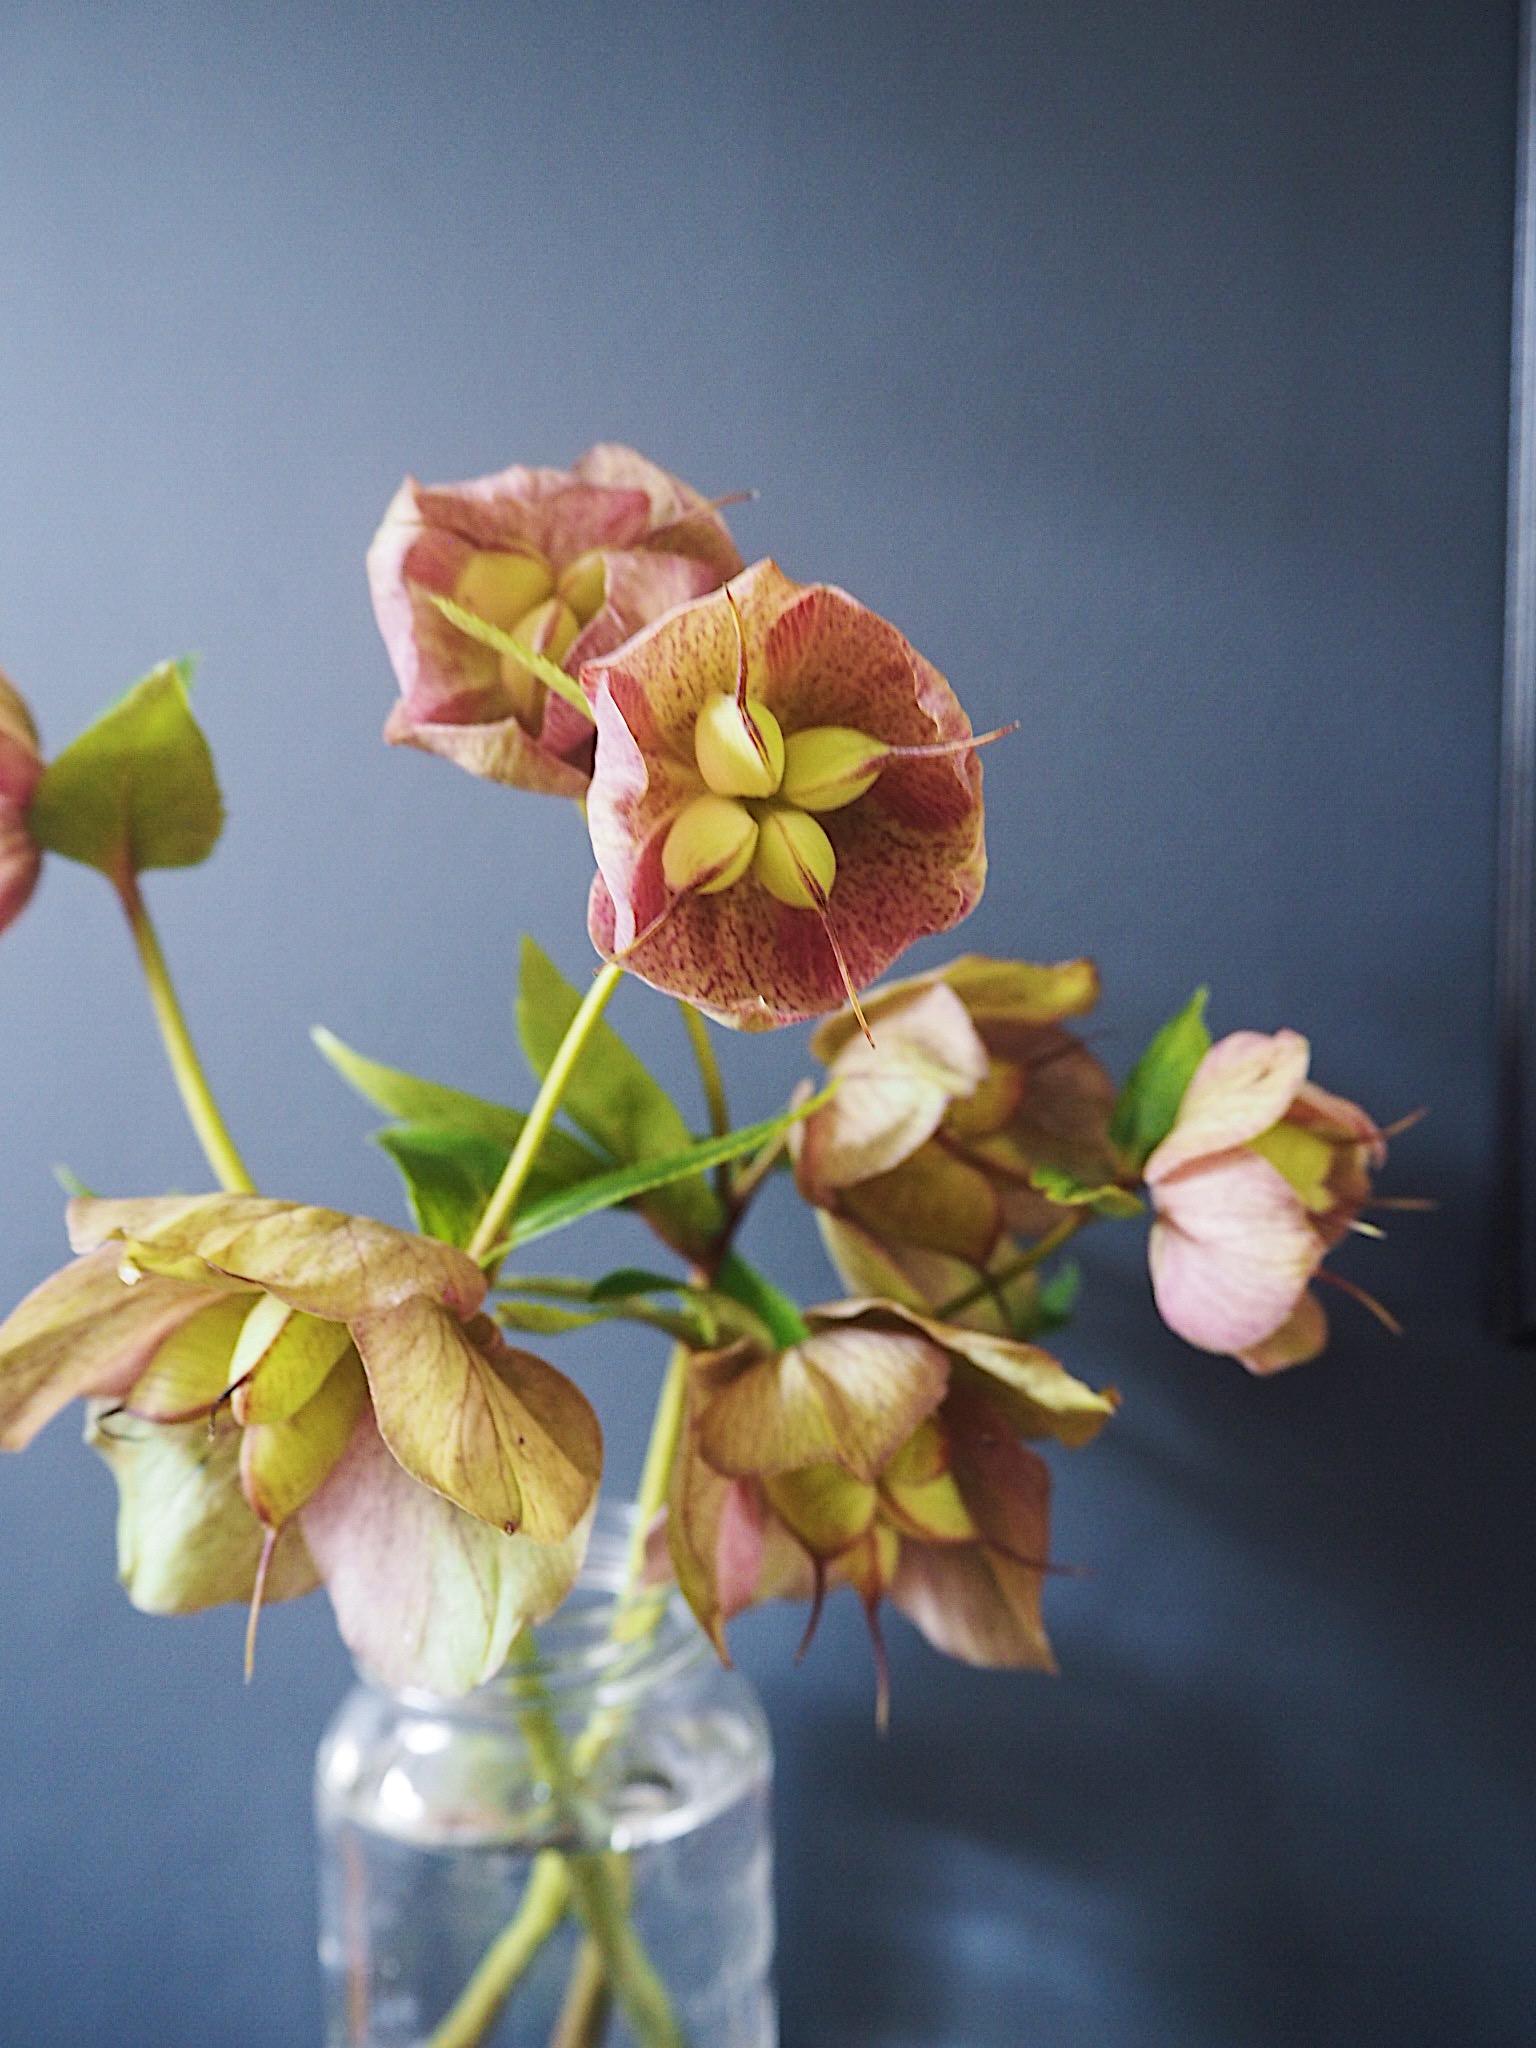 Hellbore flowers against Railings by Farrow & Ball